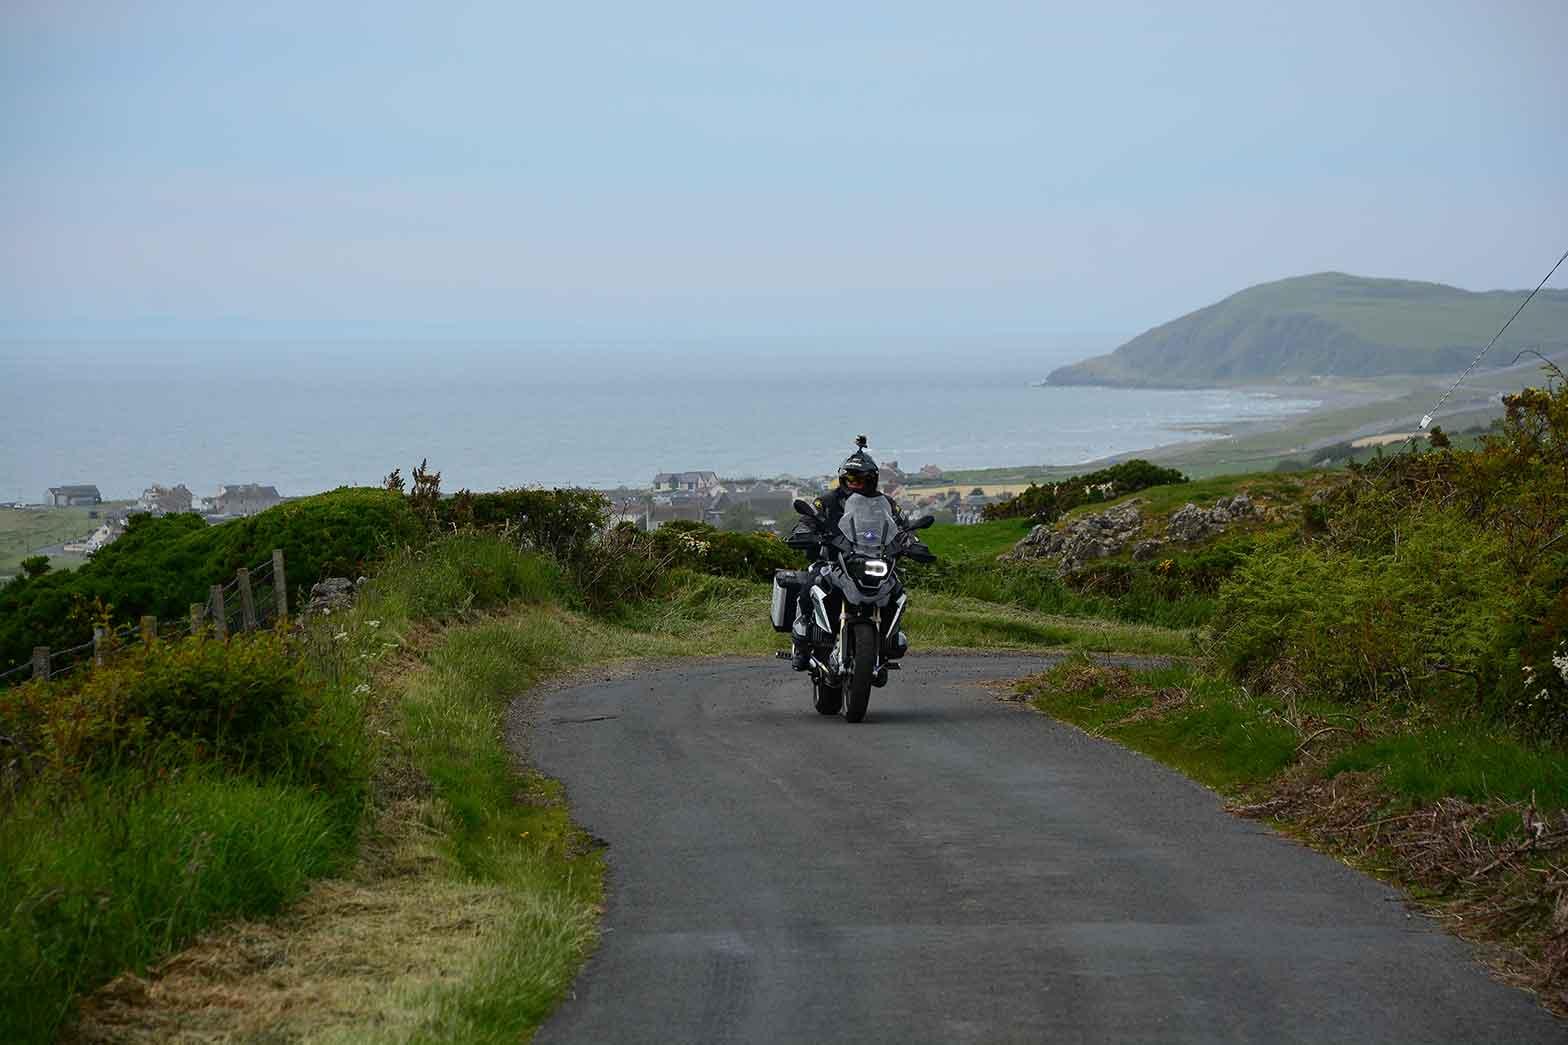 Riding the coastline of Scotland